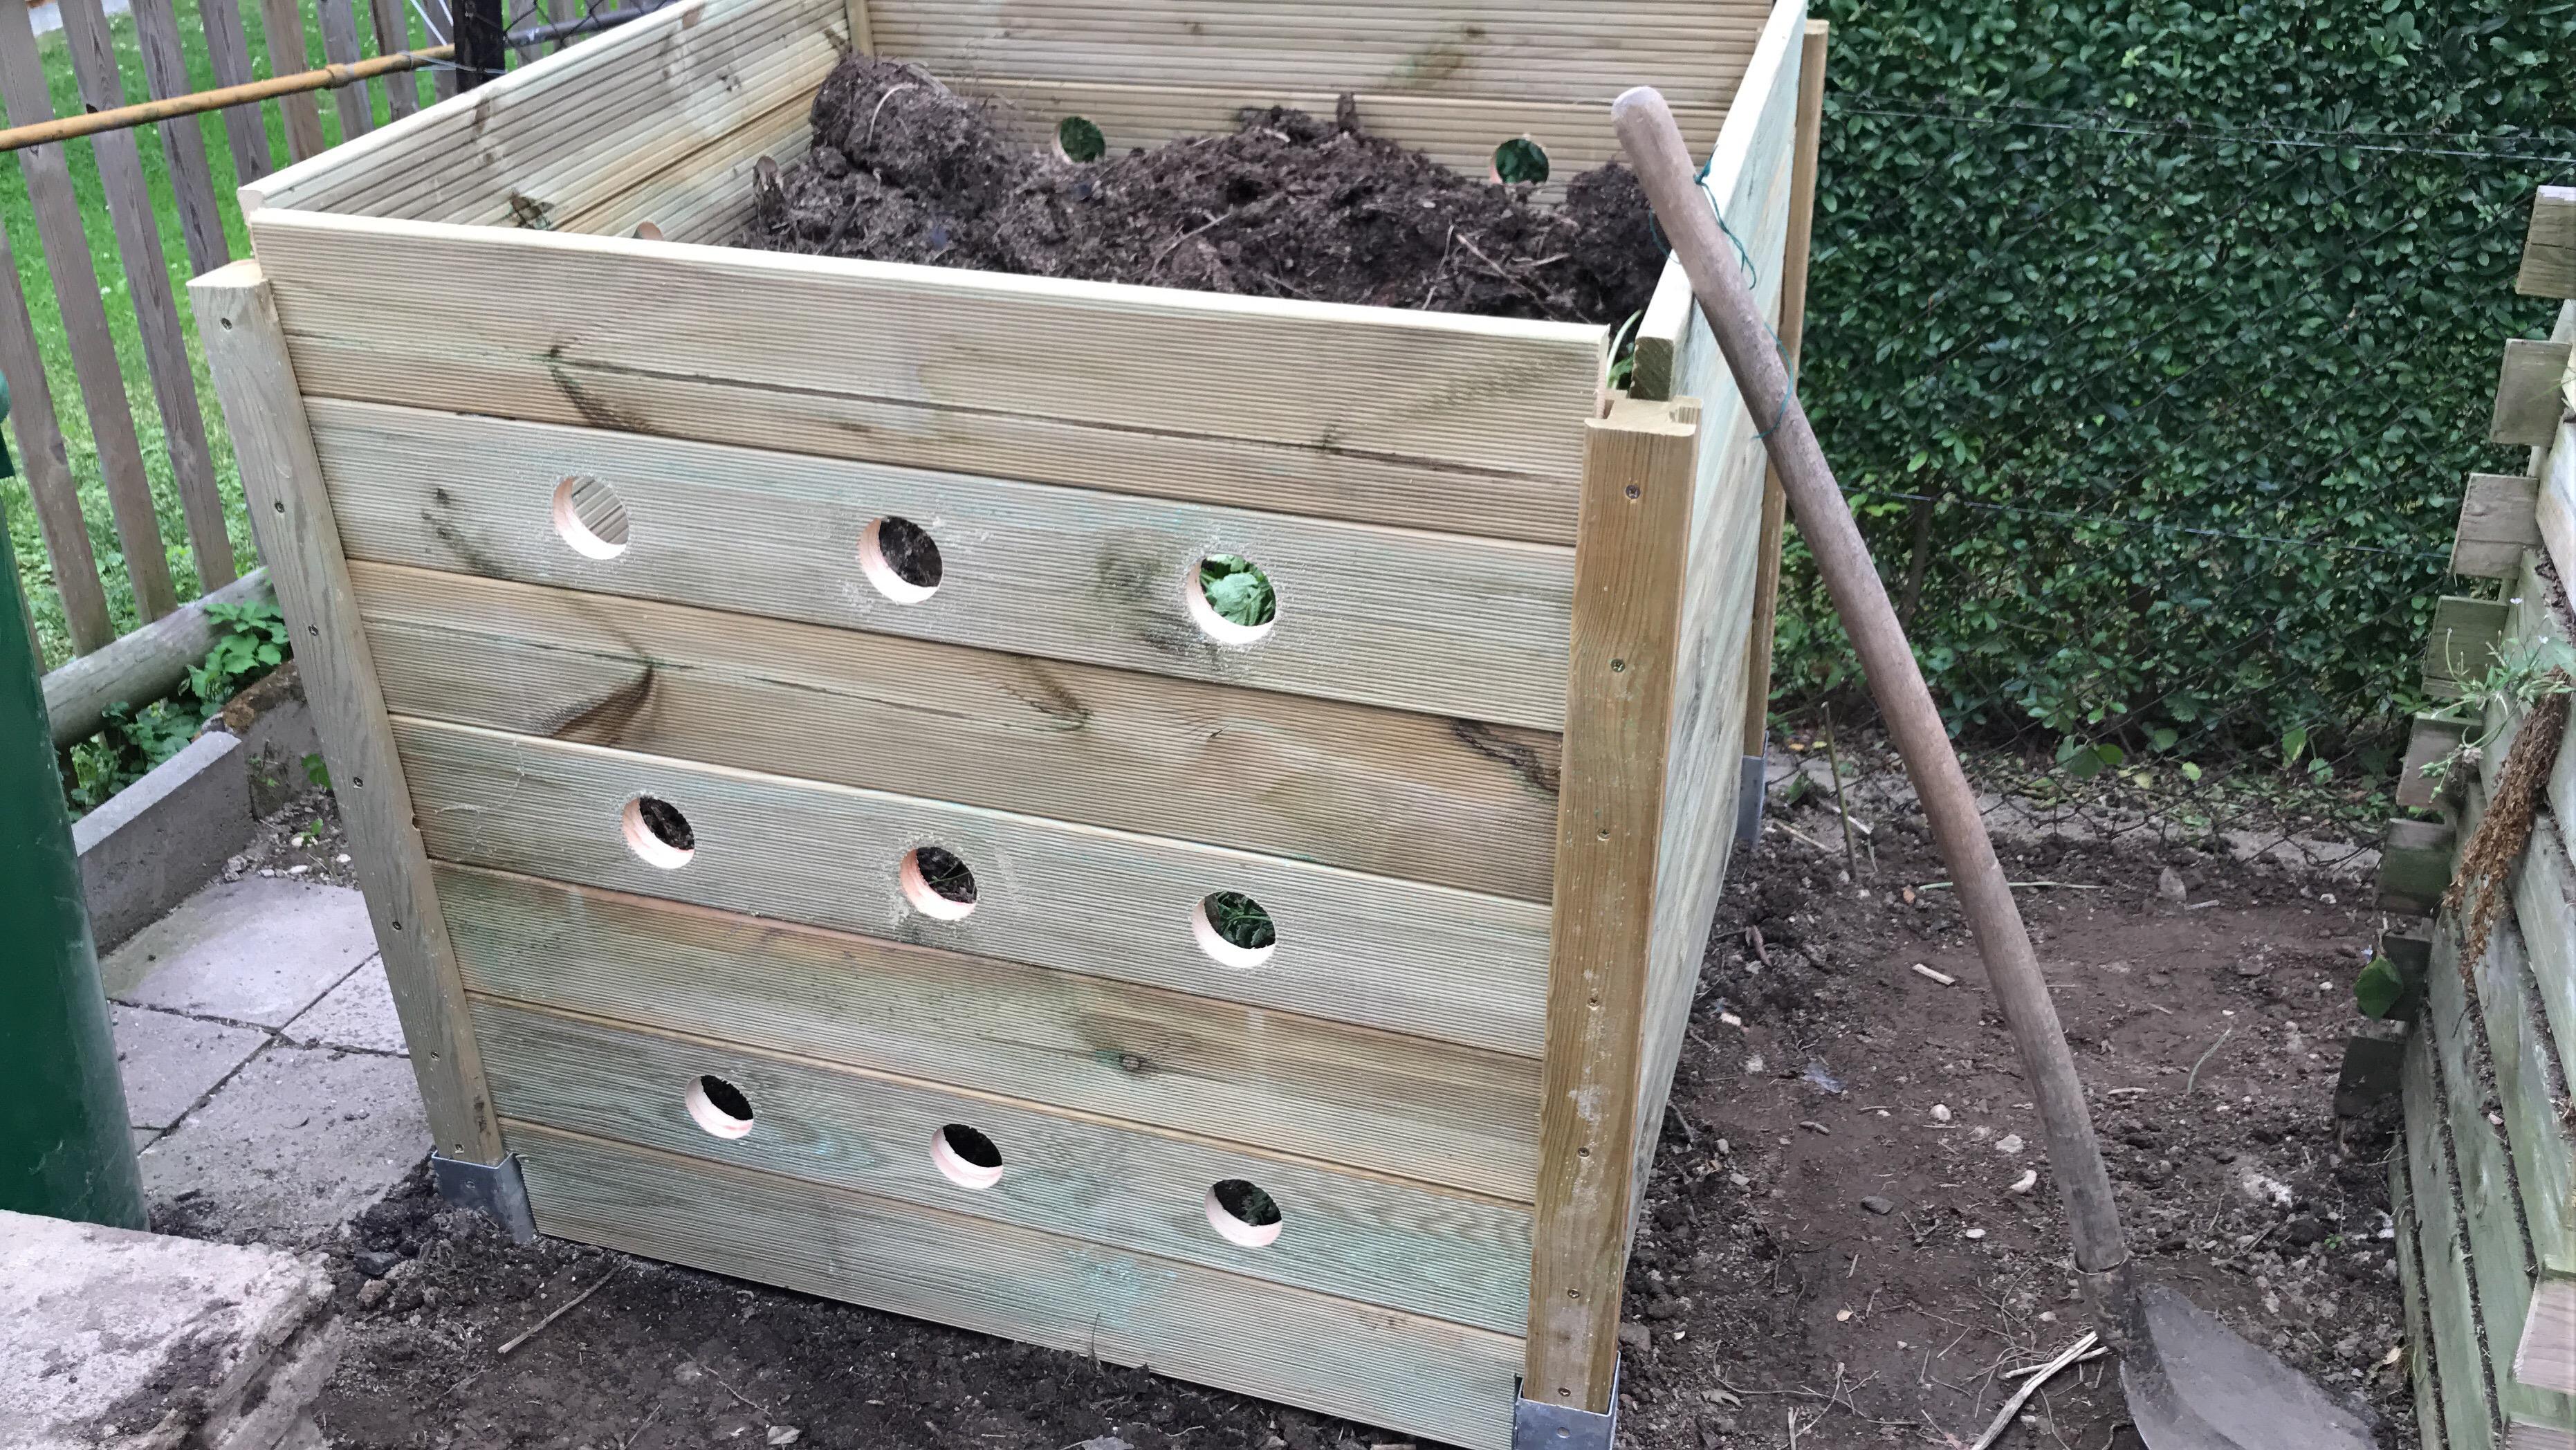 kompost boxen eigenbau – tinker works